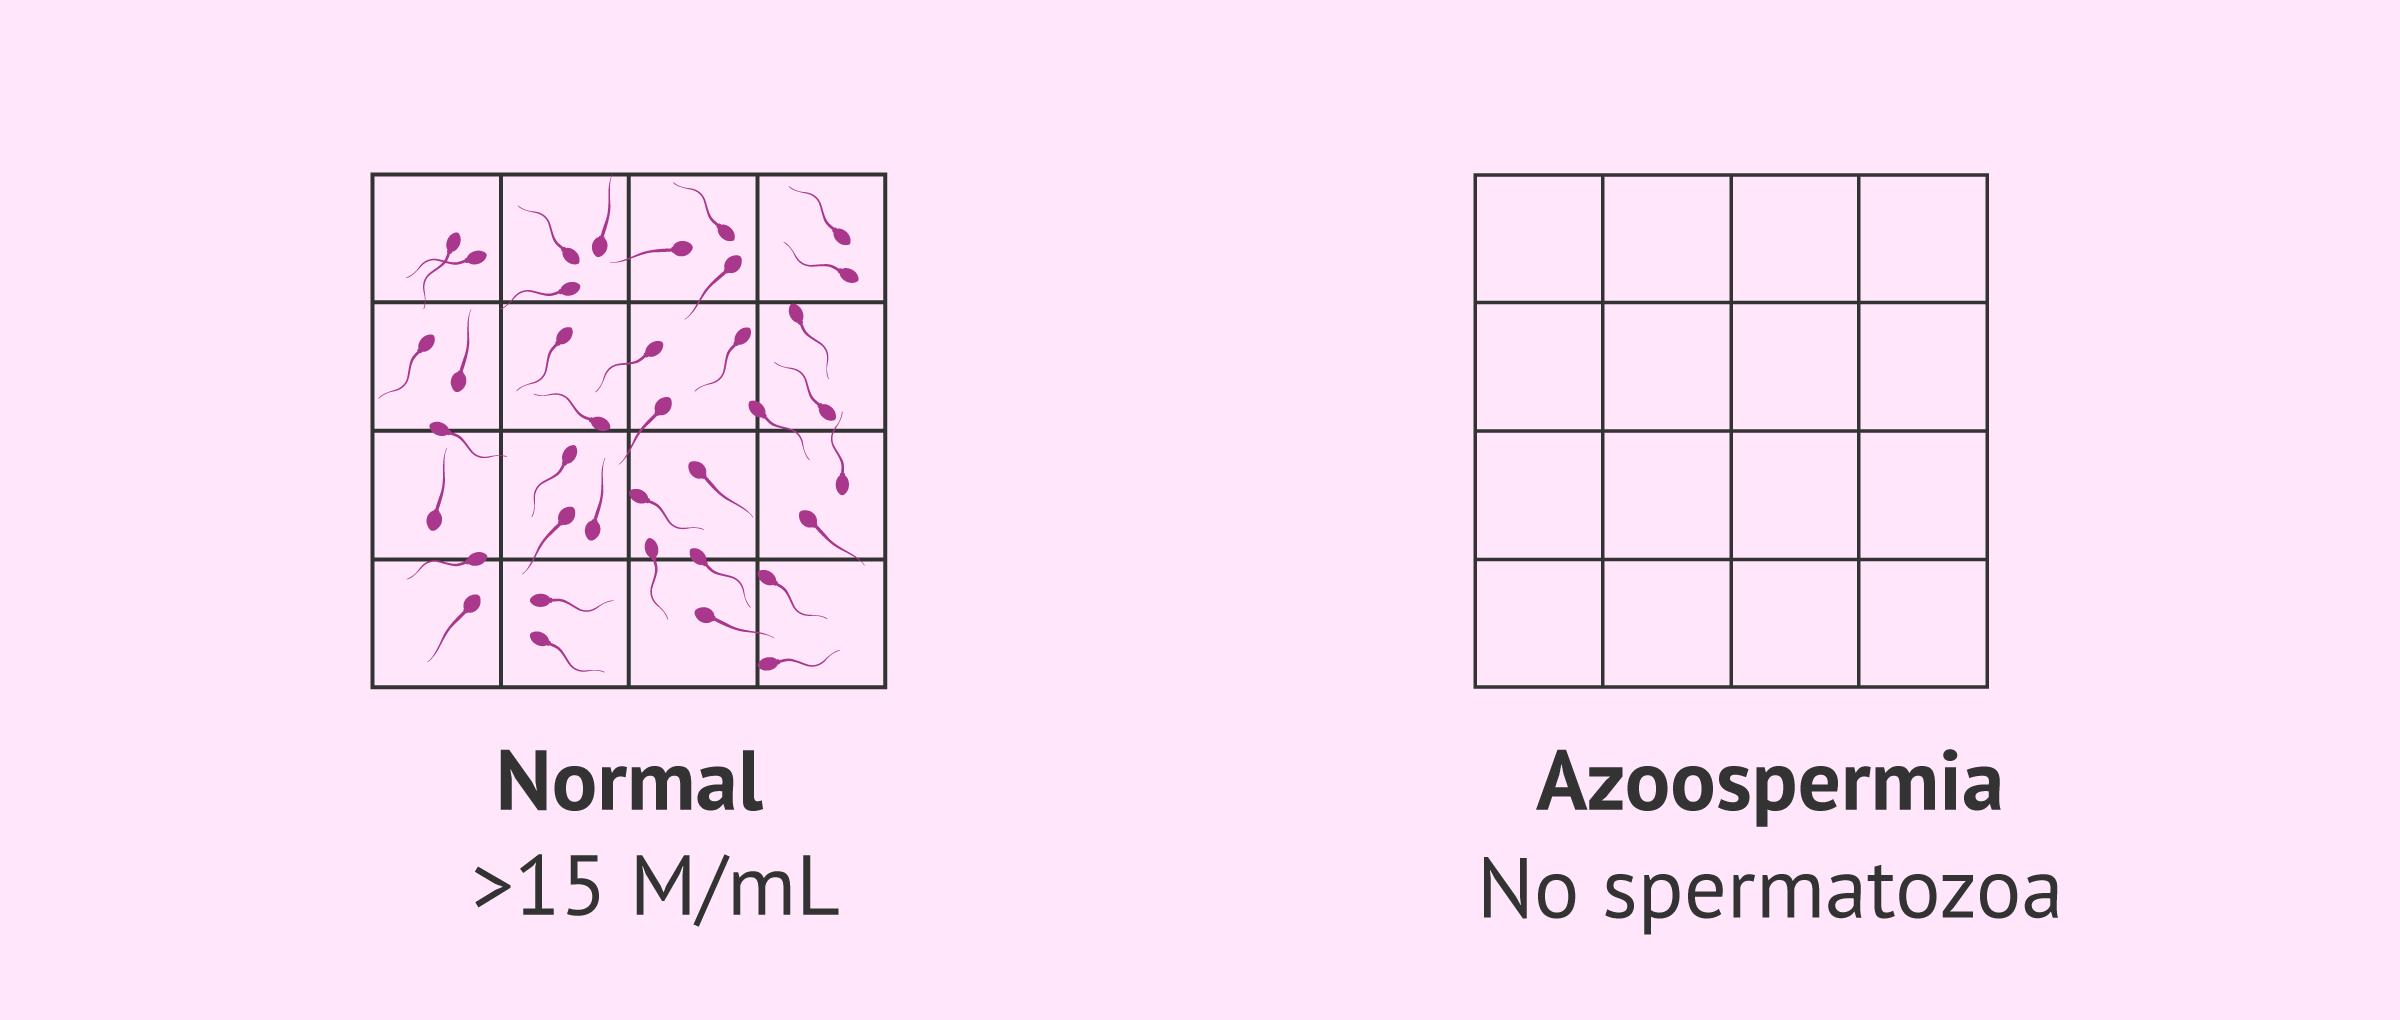 Normal sperm sample and semen sample with azoospermia